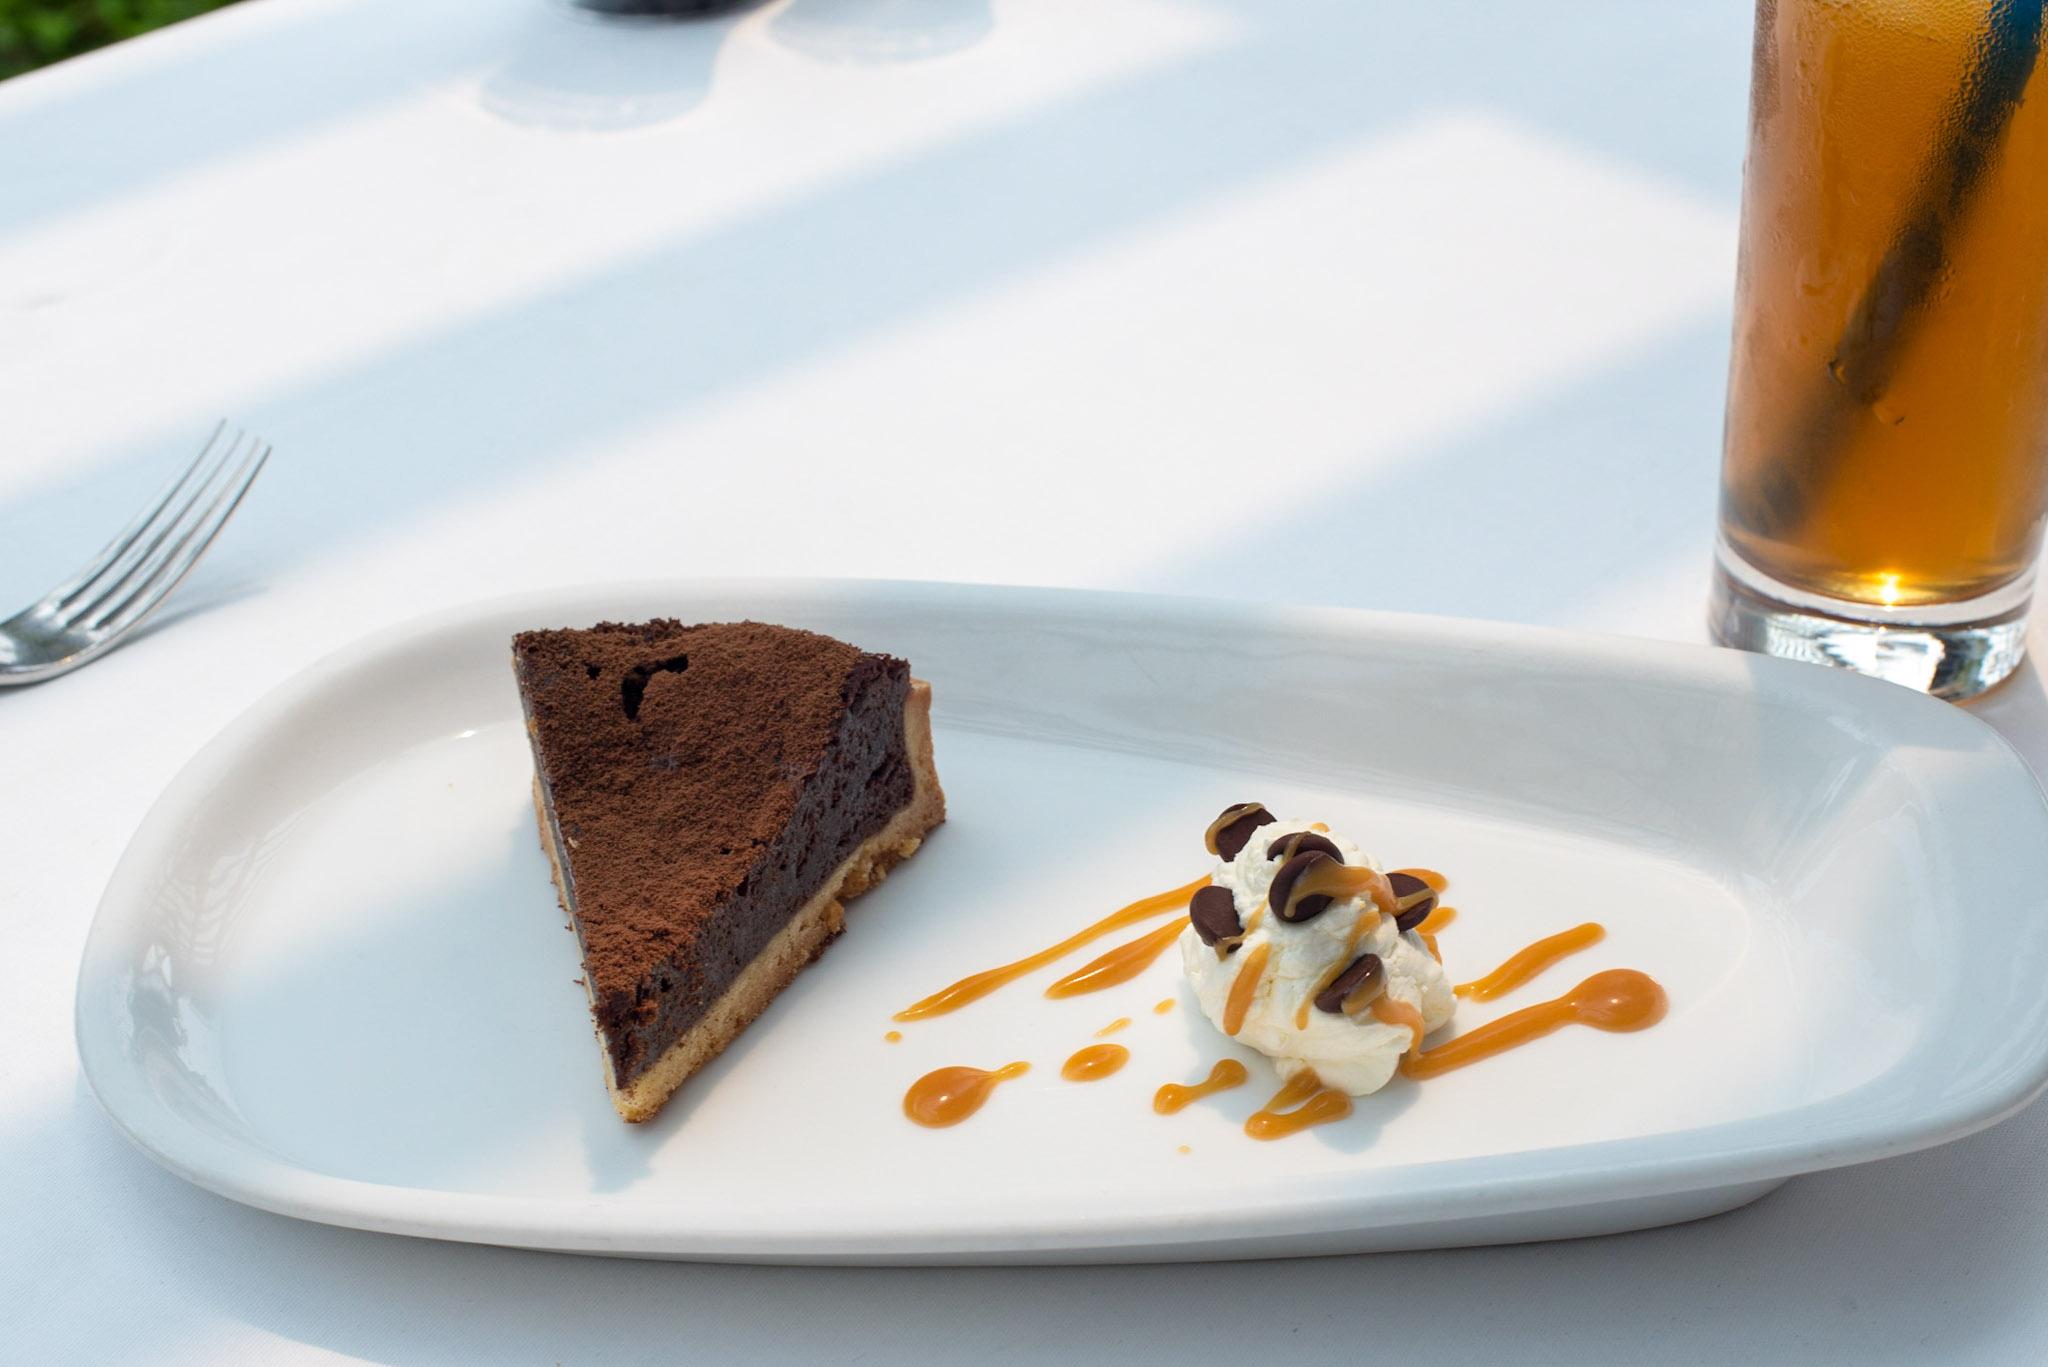 Chocolate Antilles Tart, Salted Caramel Sauce  Pool Grill - Singapore Marriott Tang Plaza Hotel